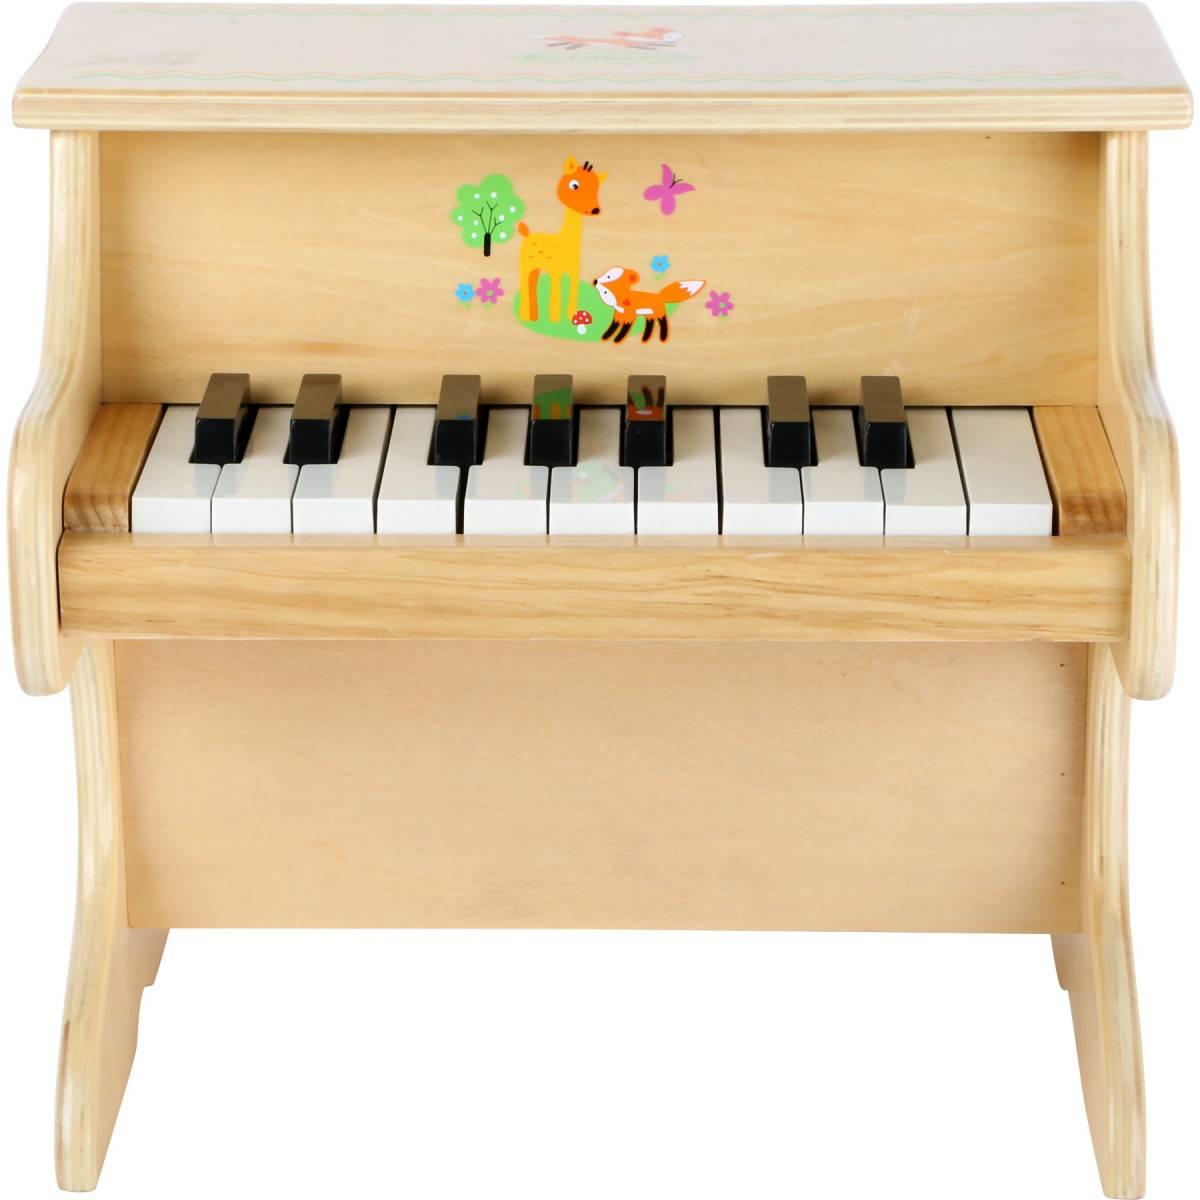 "Piano Bois Jouet ""Petit Renard"""